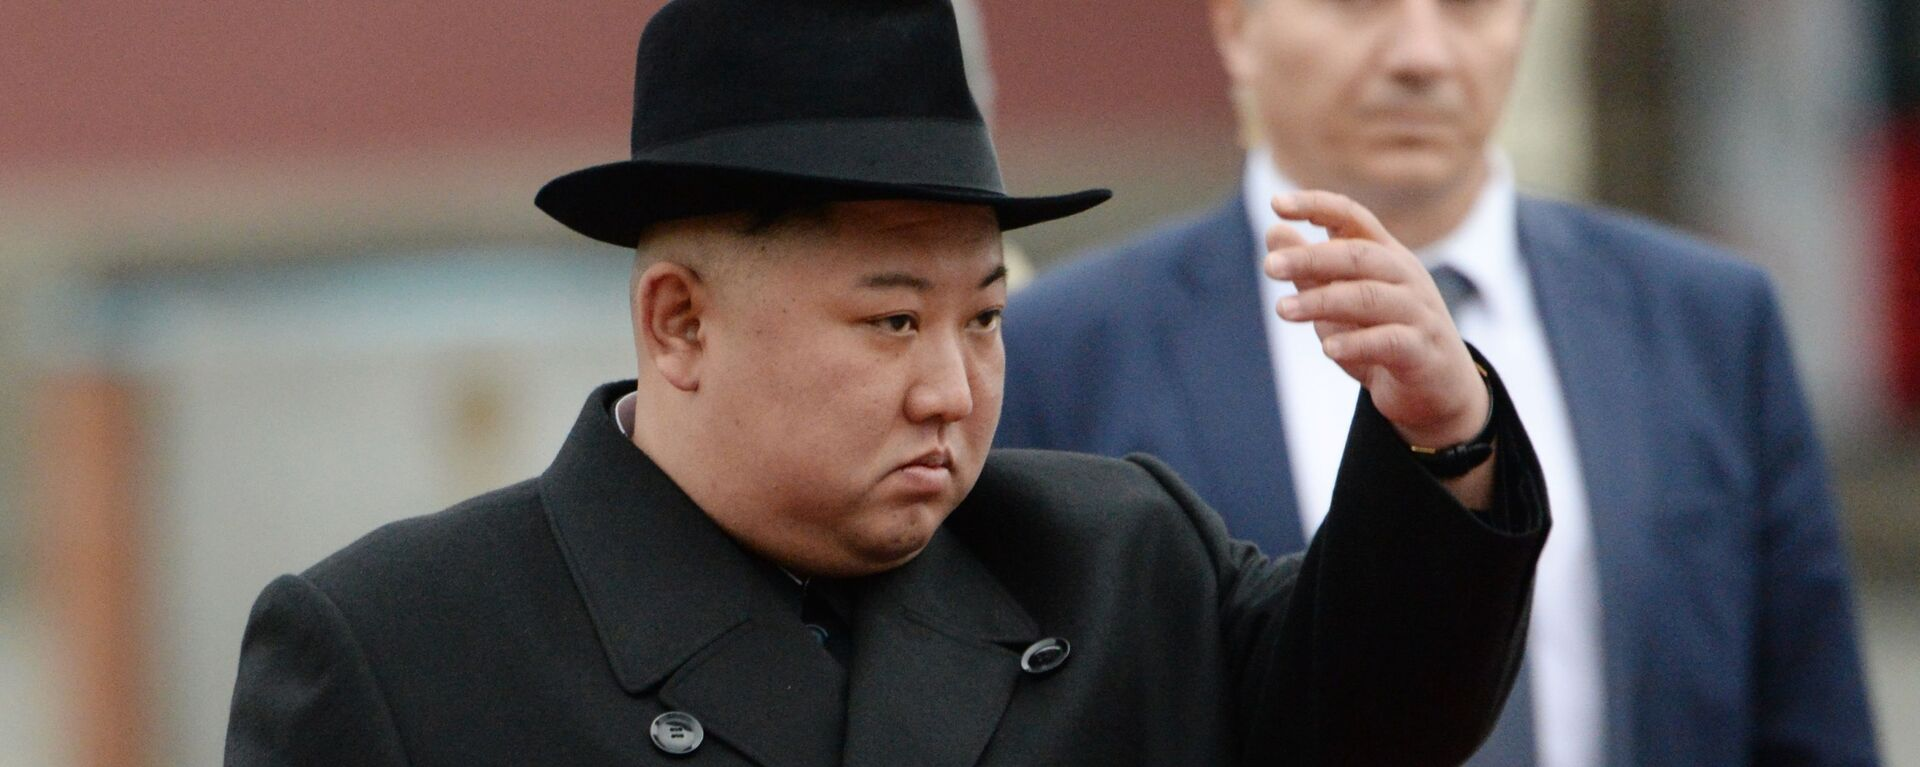 Kim Jong-un è arrivato a Vladivostok - Sputnik Italia, 1920, 05.06.2021